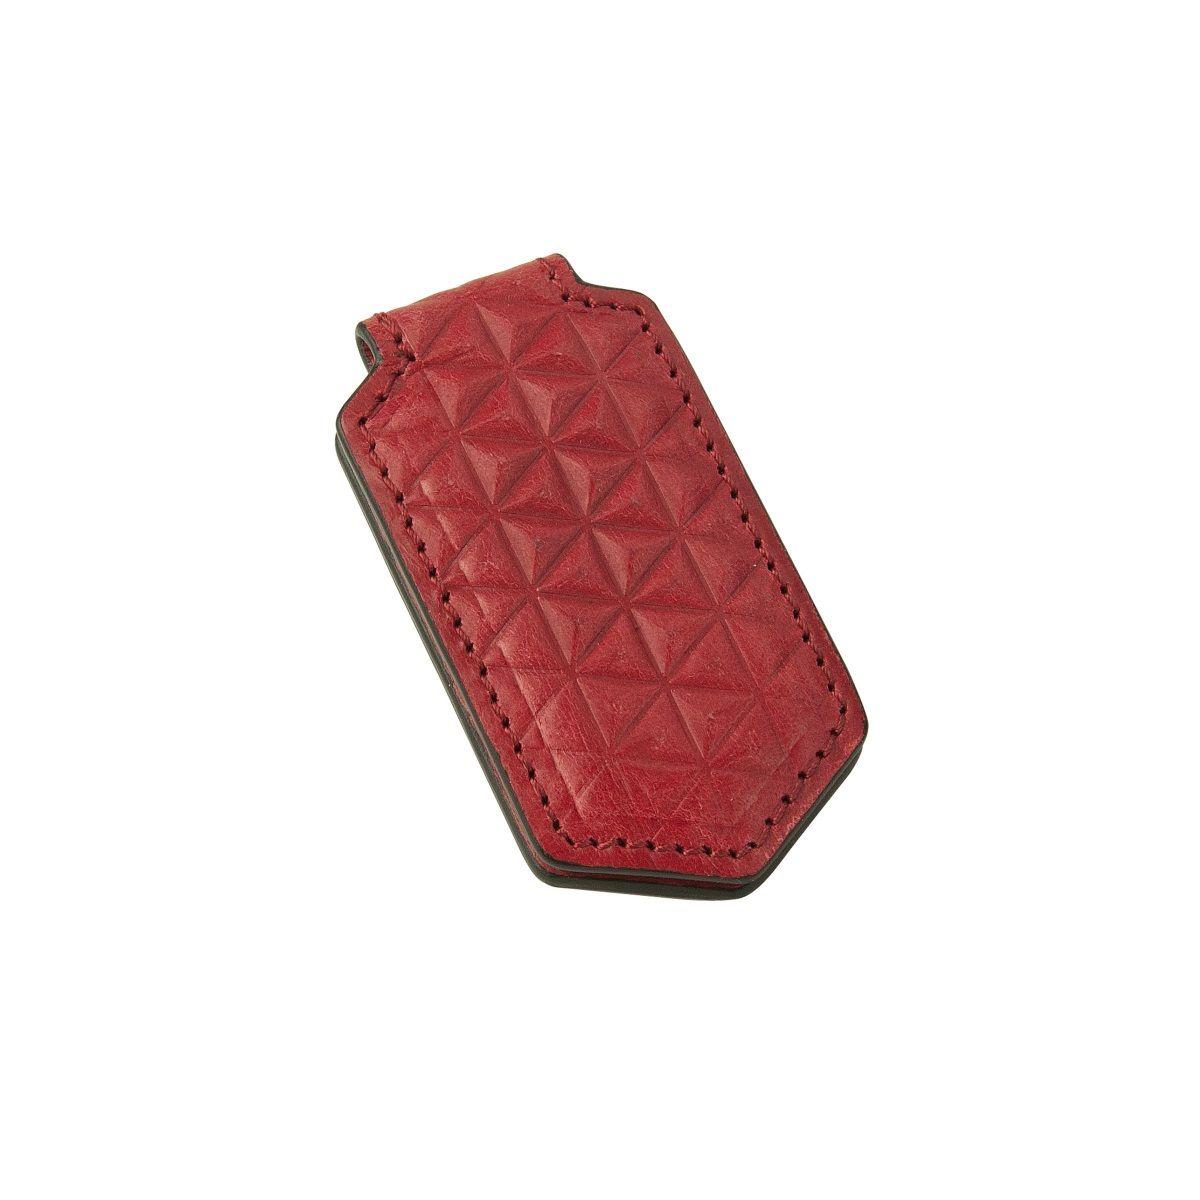 J.FOLD J.FOLD Magnaclip Tetra - Red